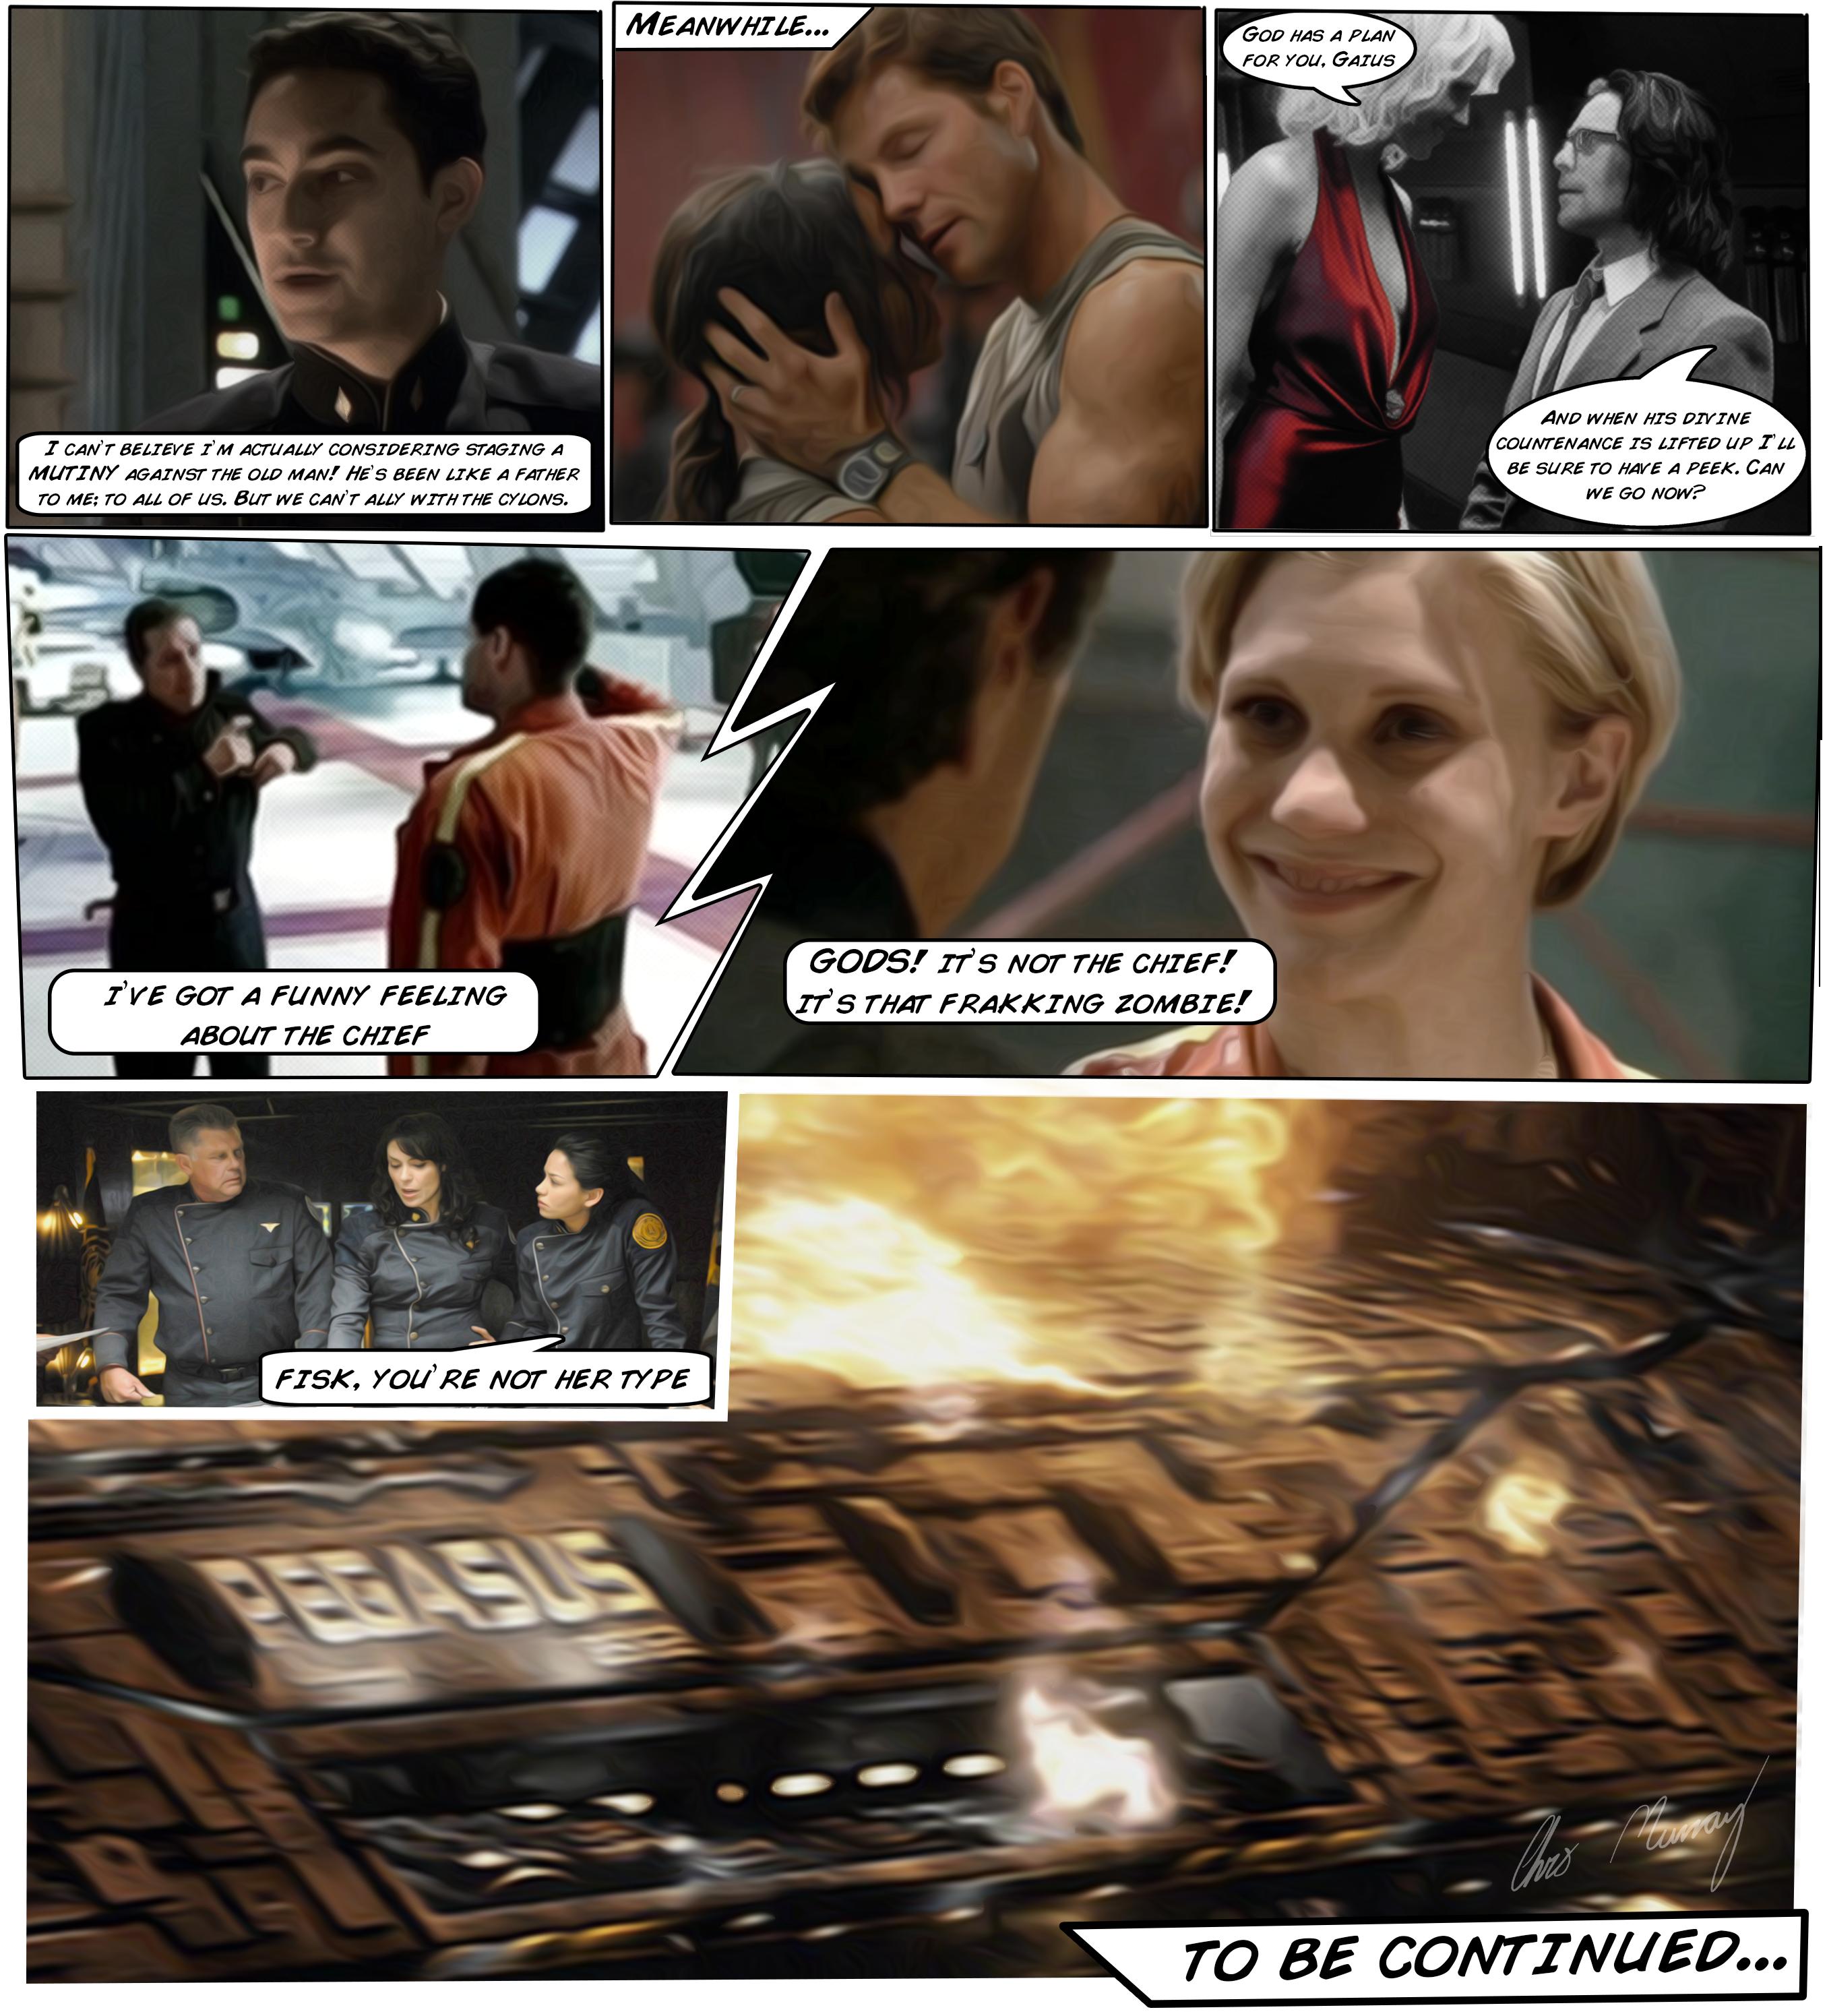 Battlestar Galactica Comic Test by Hayter